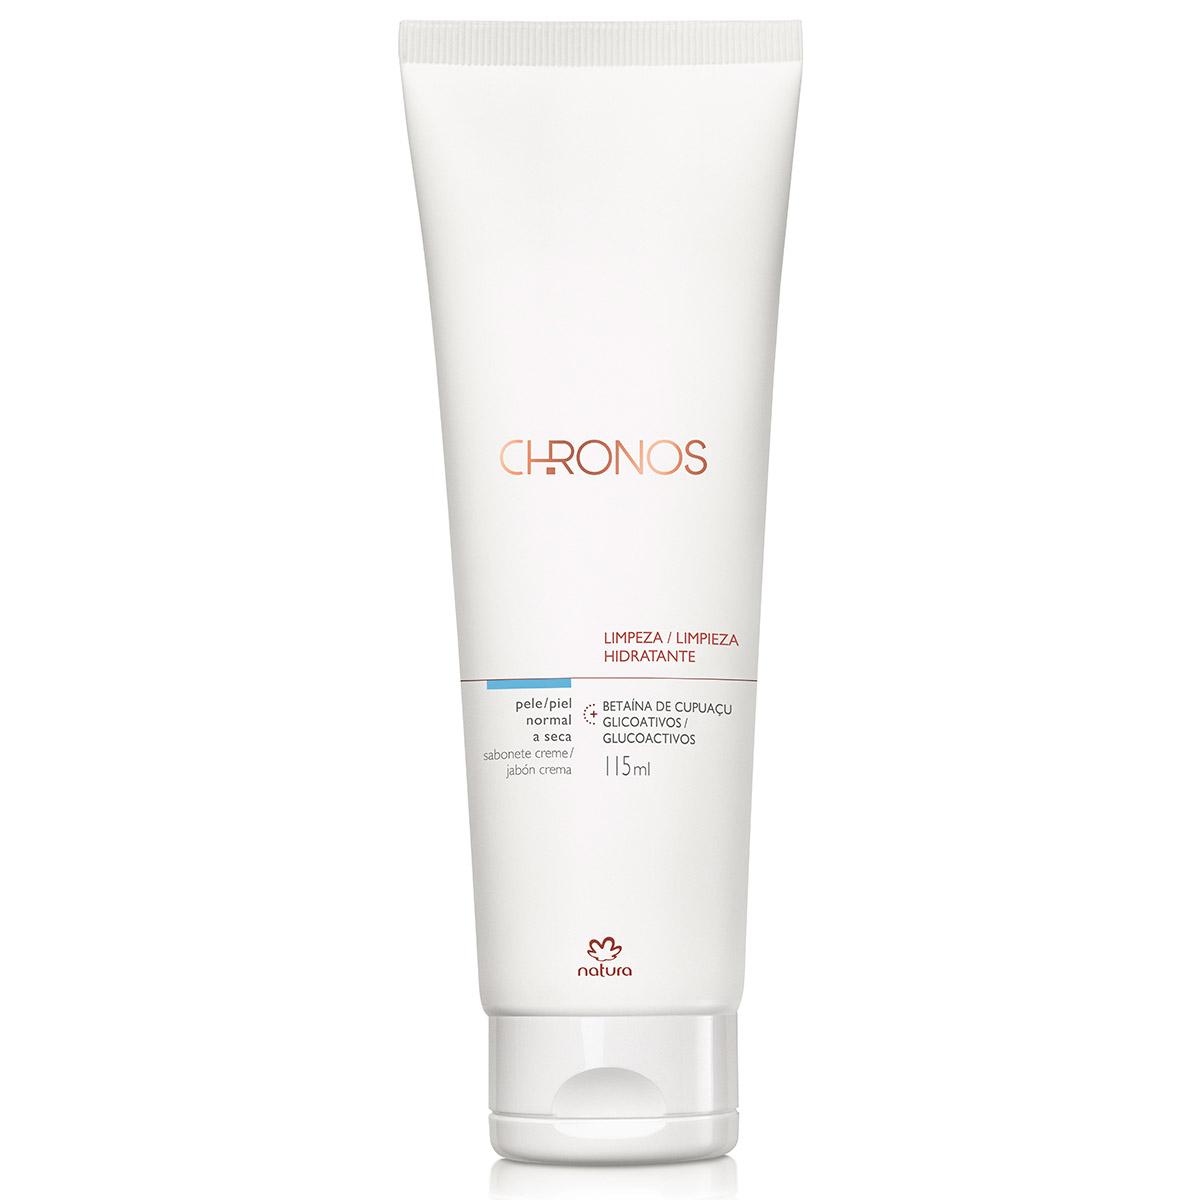 Chronos - Limpeza